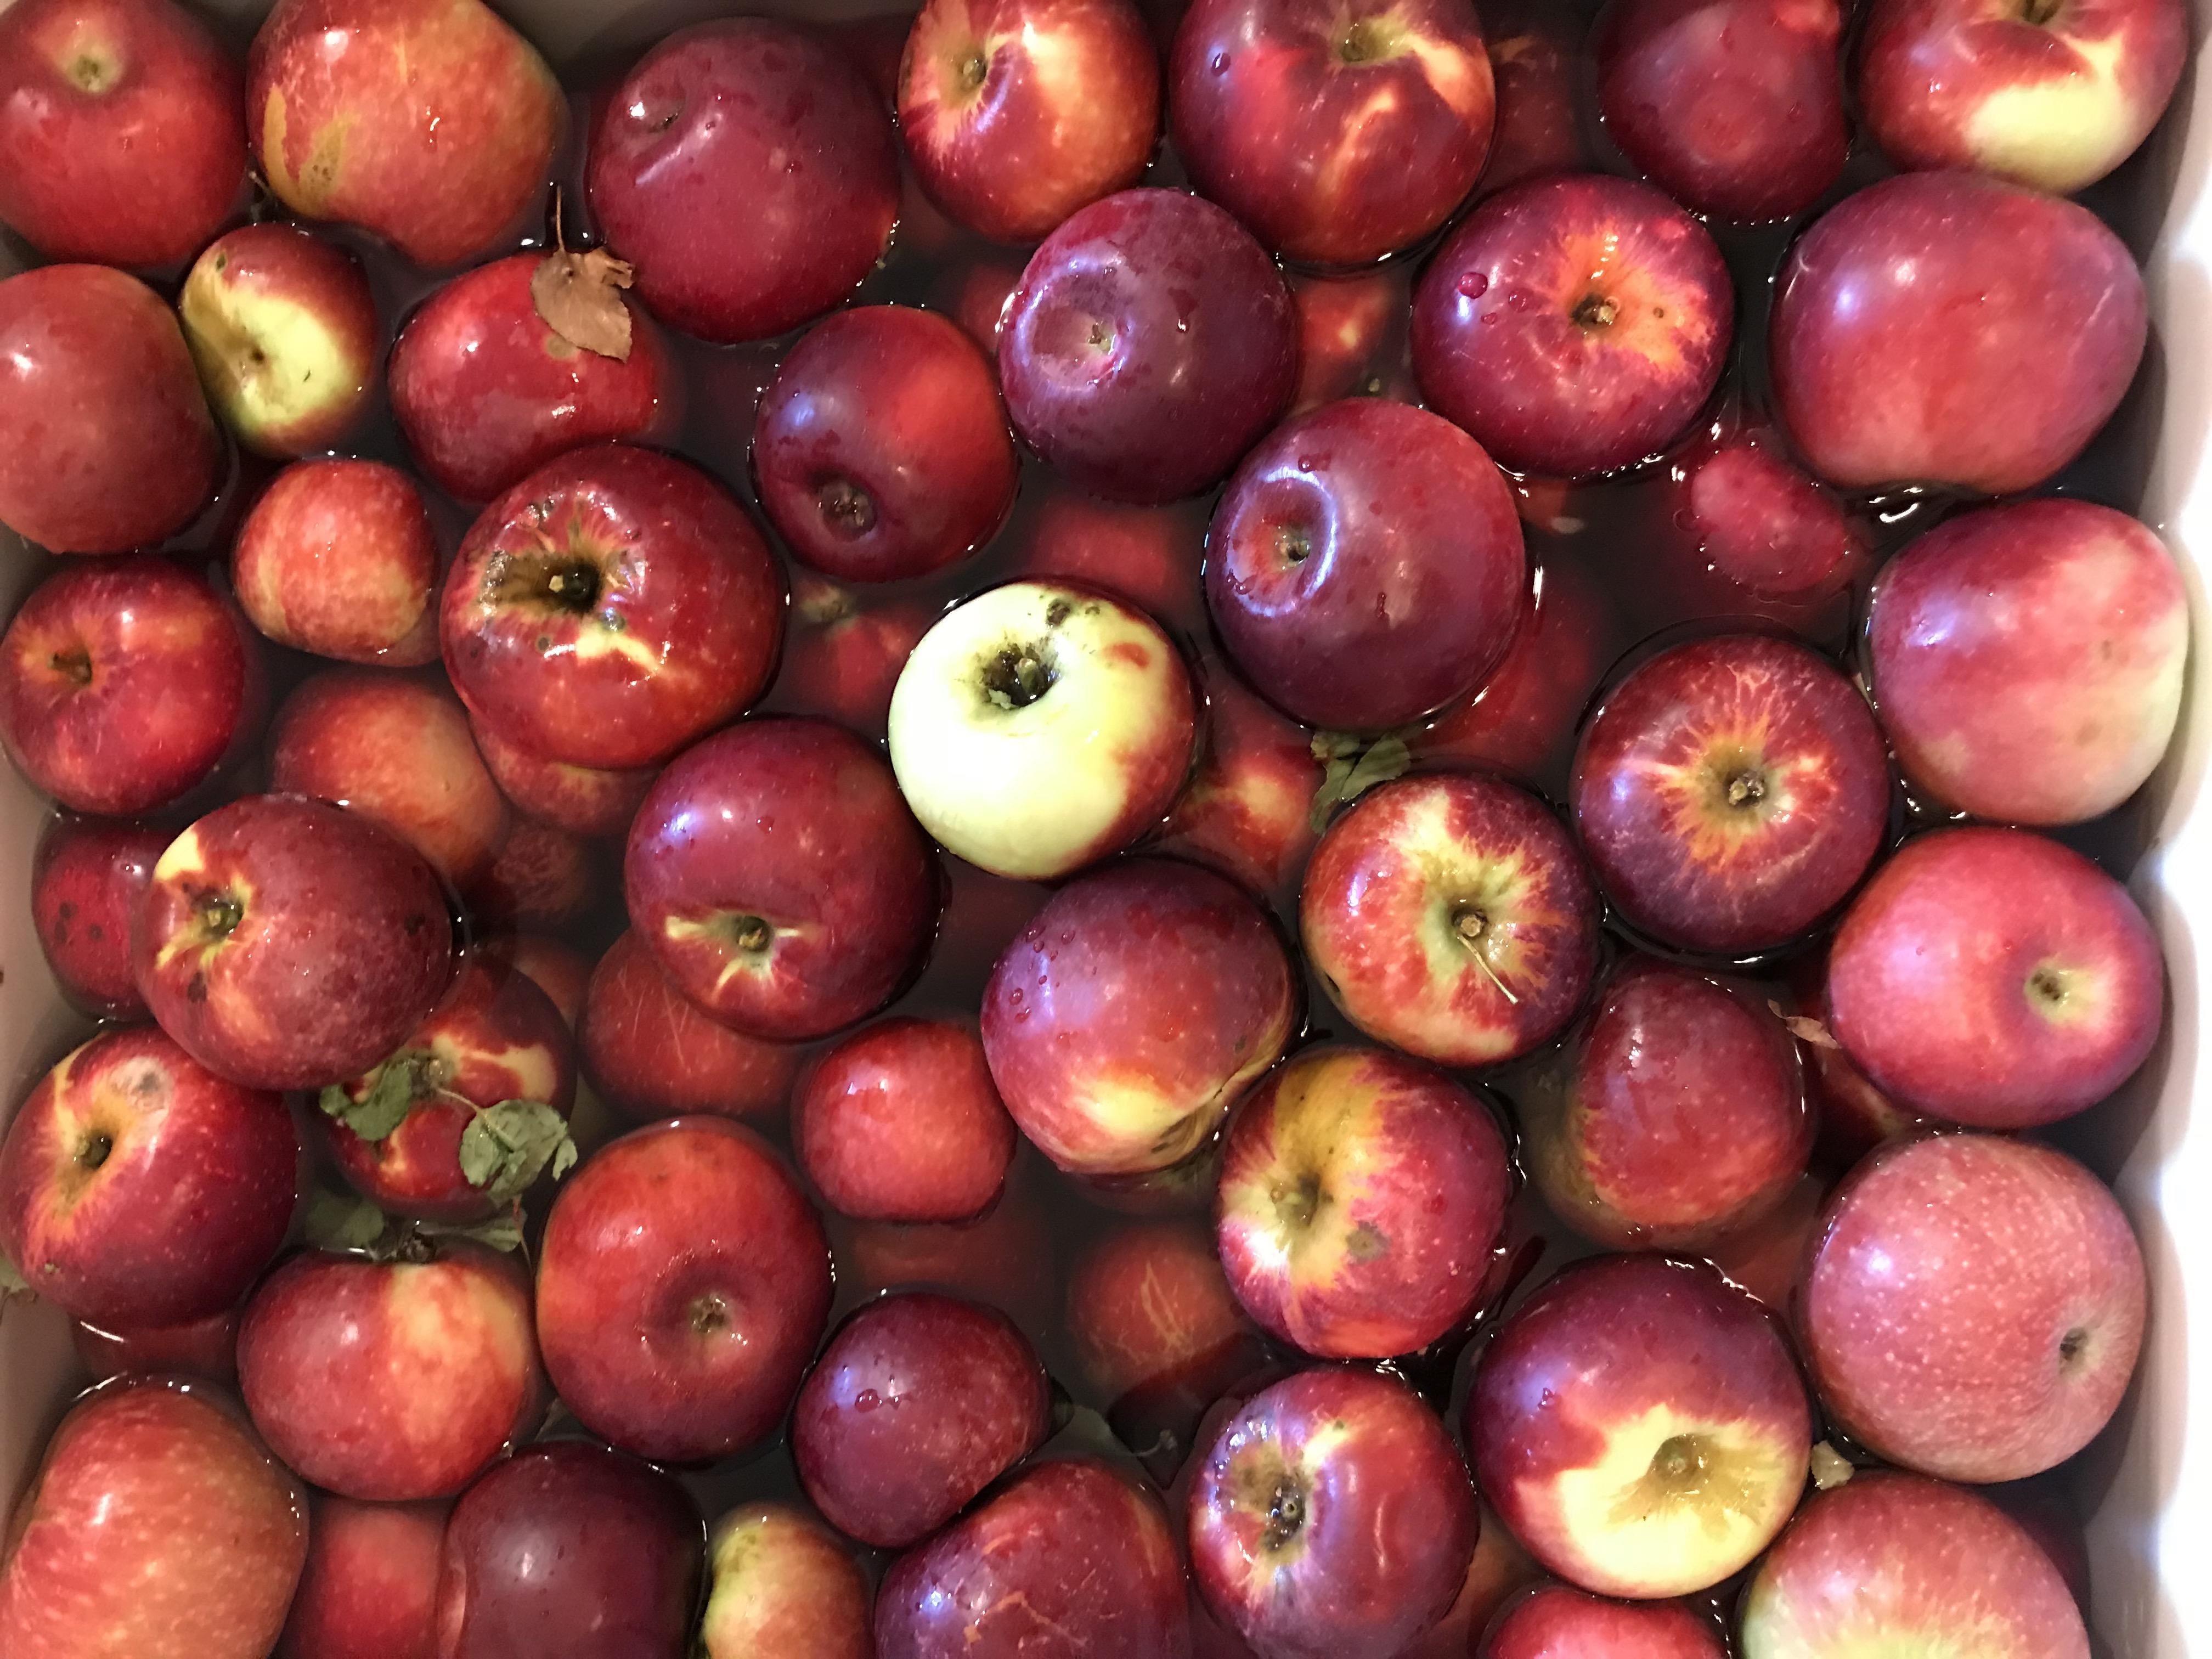 fruitvegetablestamppainting